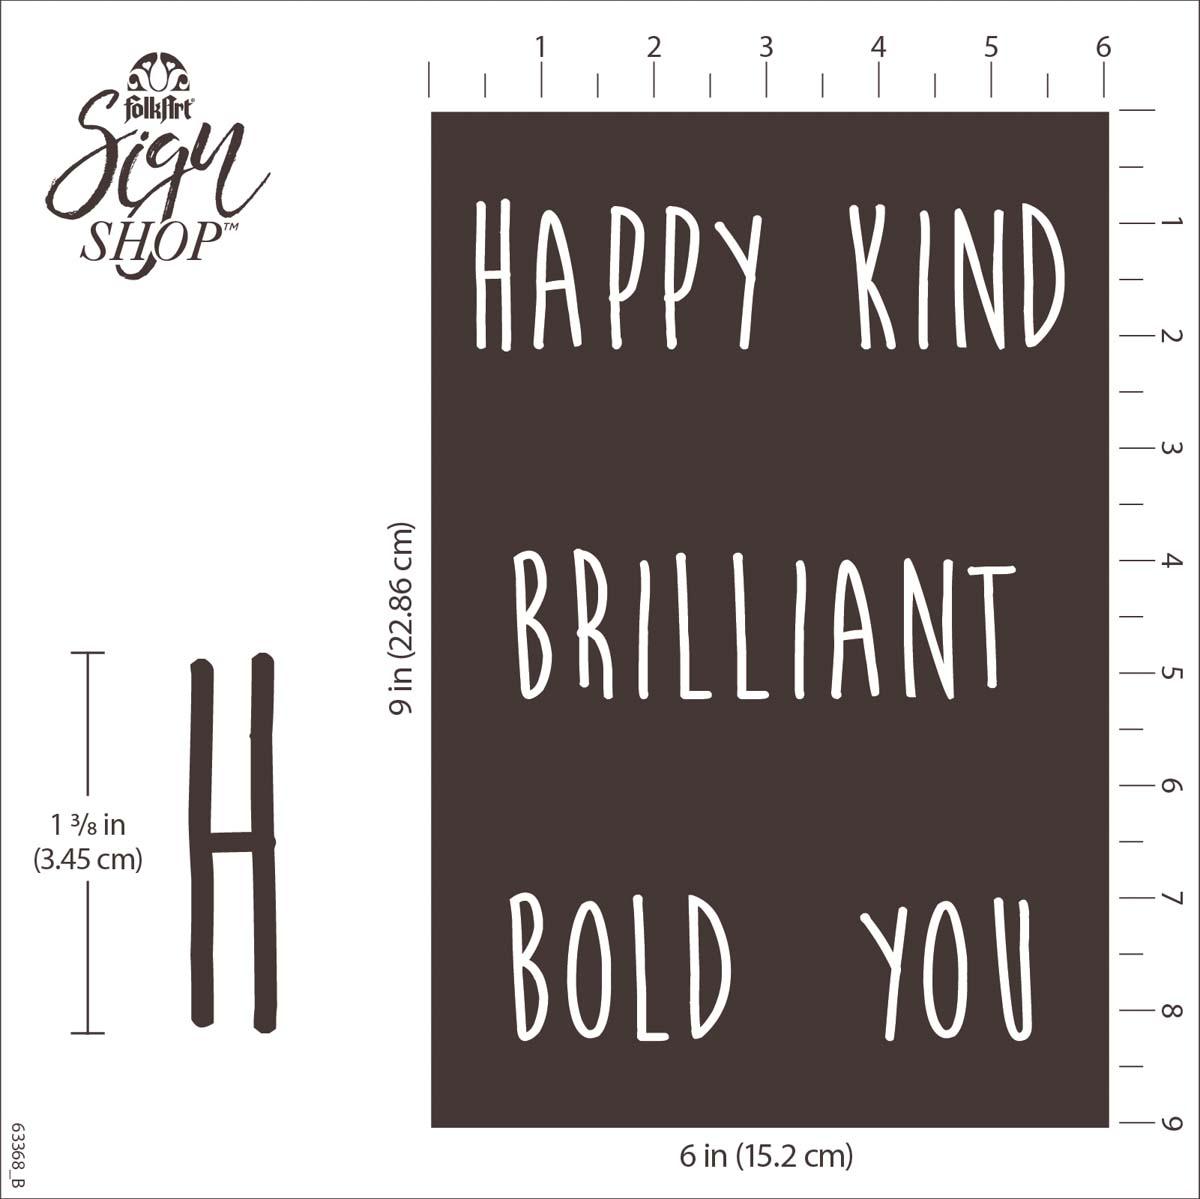 FolkArt ® Sign Shop™ Mesh Stencil - Be You, 2 pc. - 63368